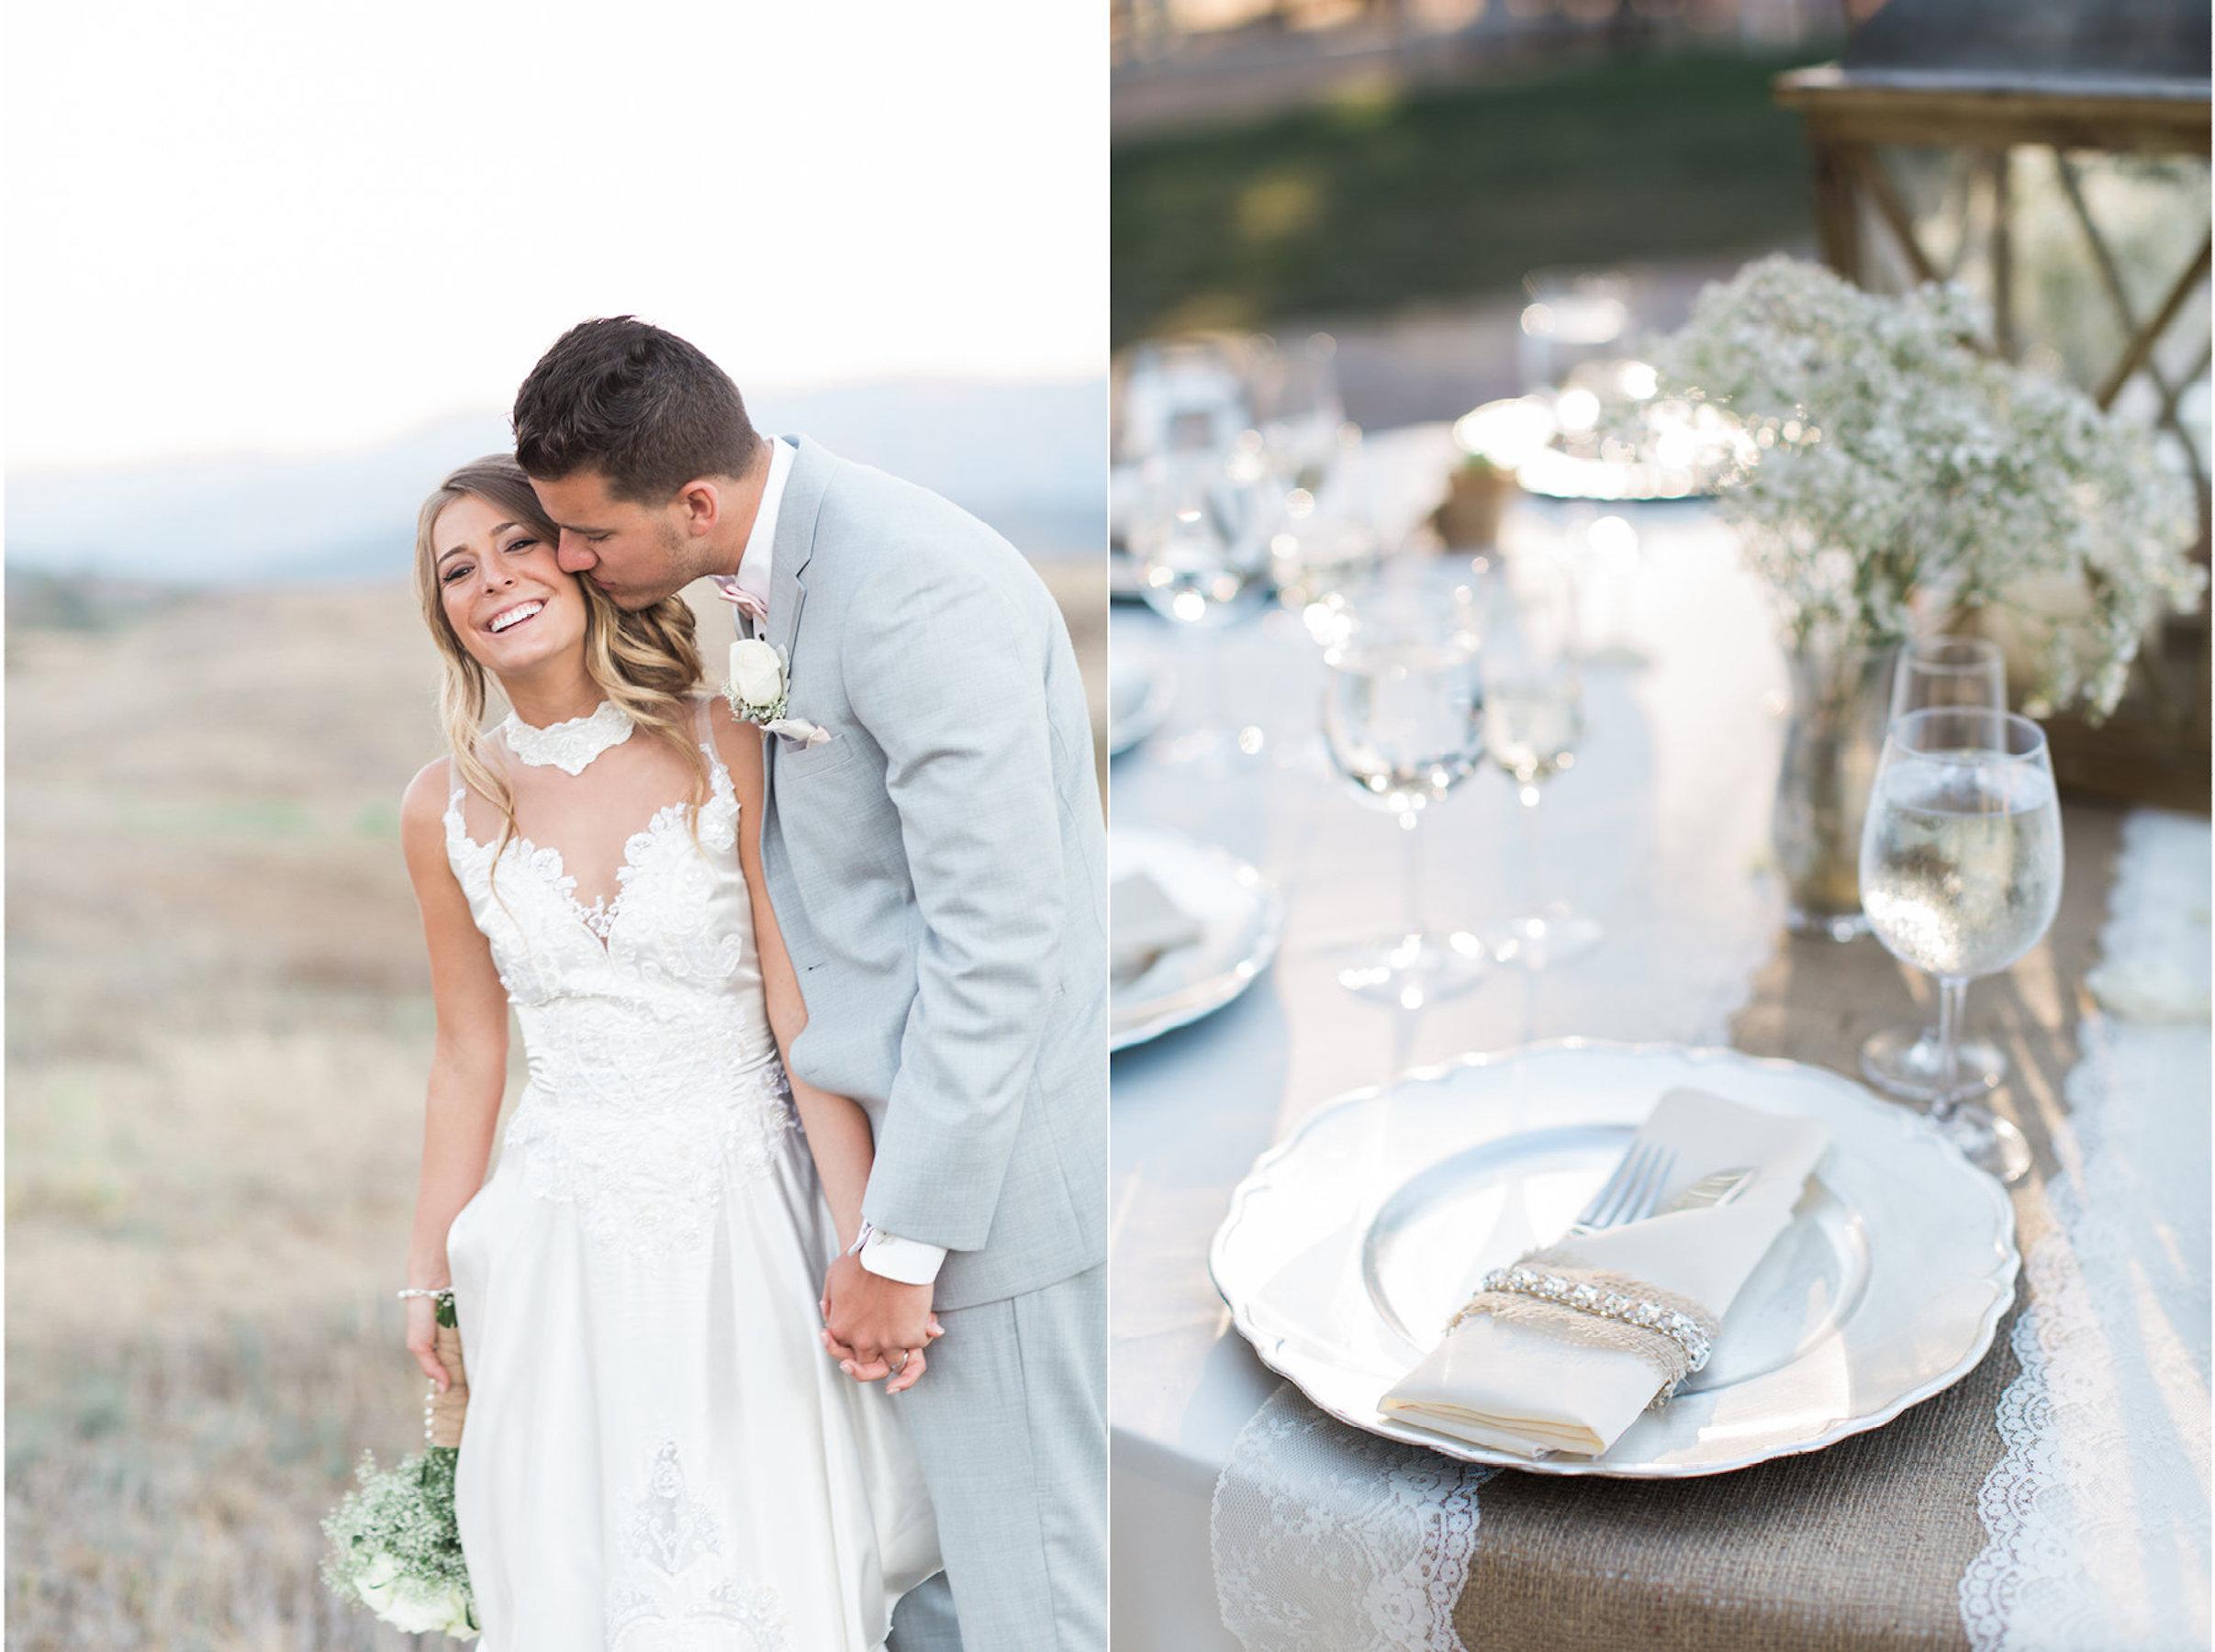 Amelia & Tim:  Venue- Lake Oak Meadows, Temecula, Ca; Photography- Lauriana Fortuna; Decor & Rentals- Farm Girl Weddings; Wedding Gown Redesign- Cherie Riley Weddings